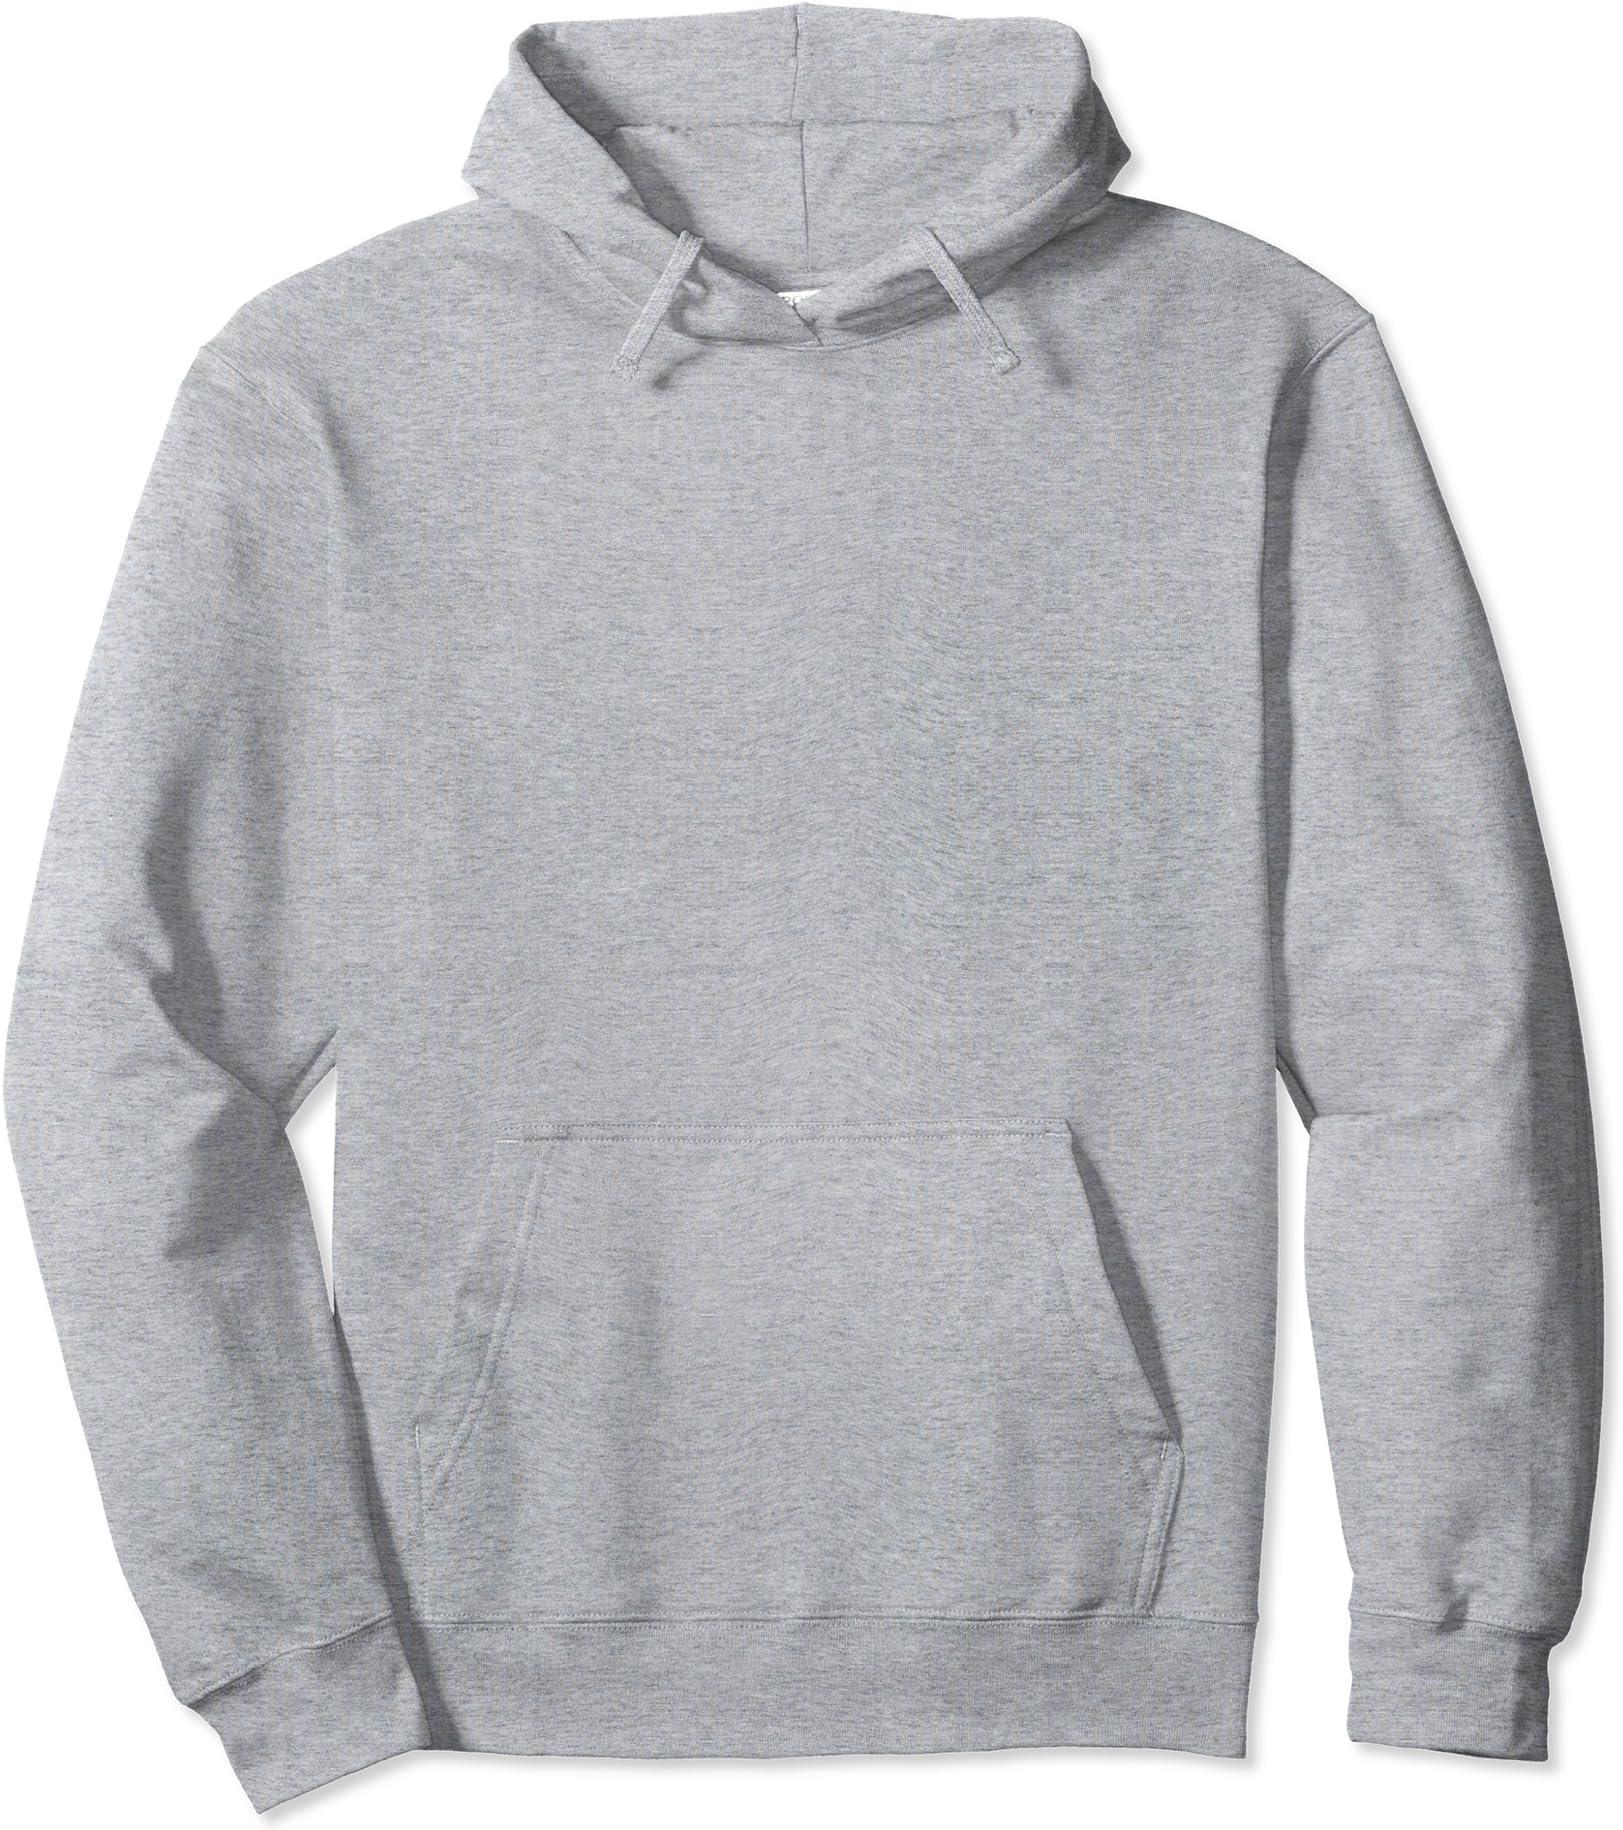 It/'s Guinea Be a Good Wheek Hoodie Sweatshirt Pullover Guinea Pig Gift Women Kid